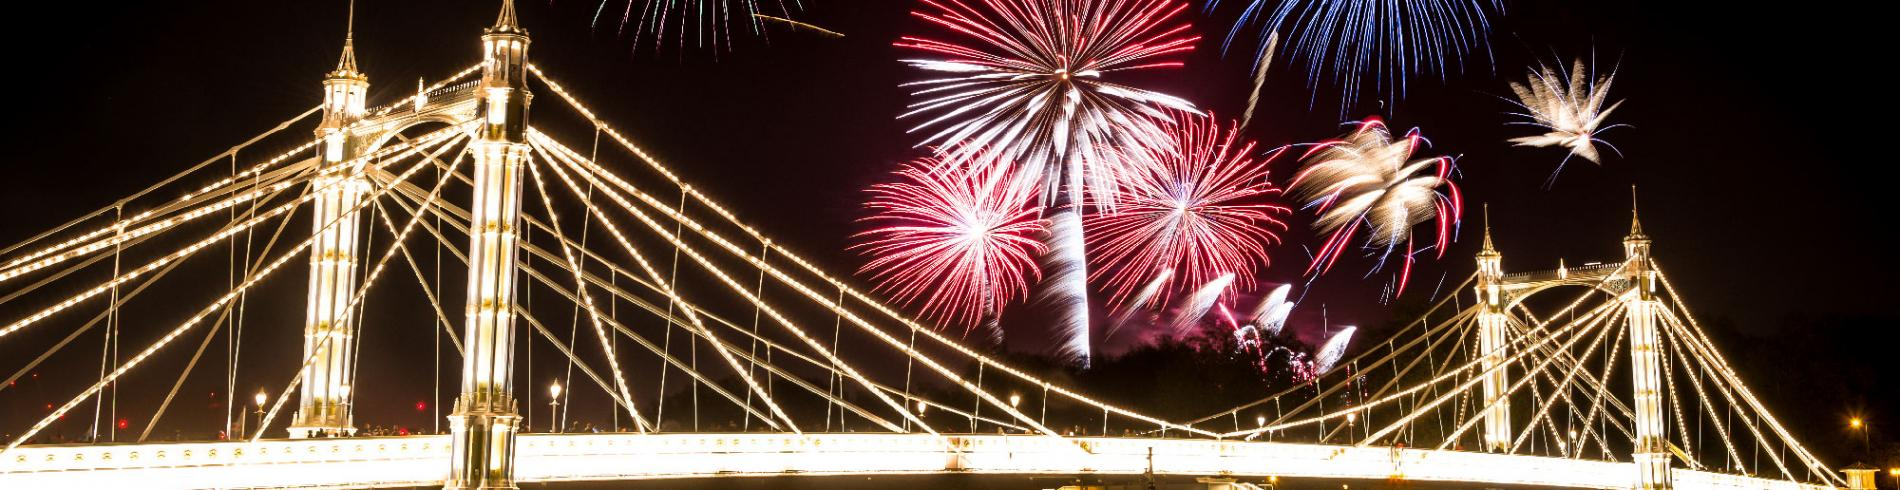 new year's eve fireworks above battersea bridge